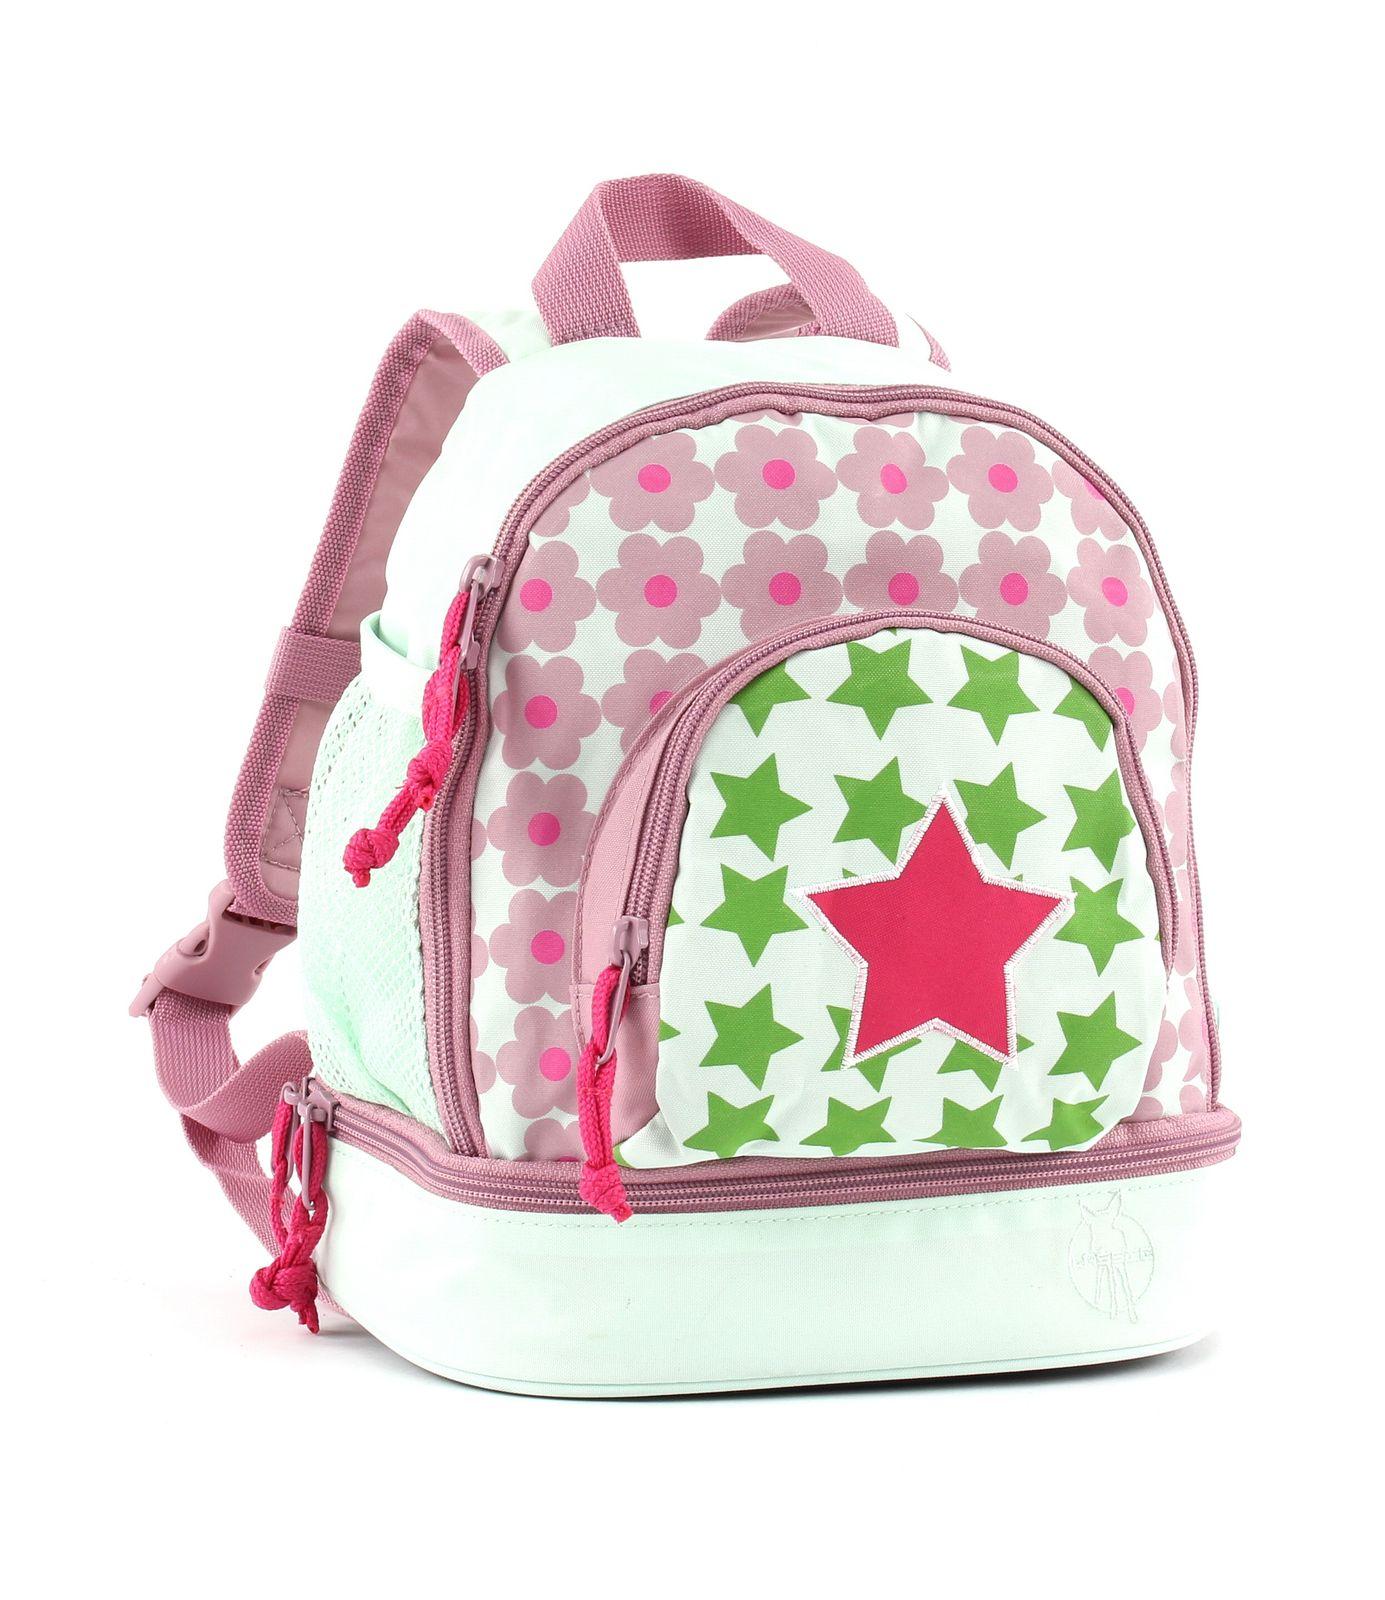 Lässig 4Kids Mini Backpack M Starlight Magenta